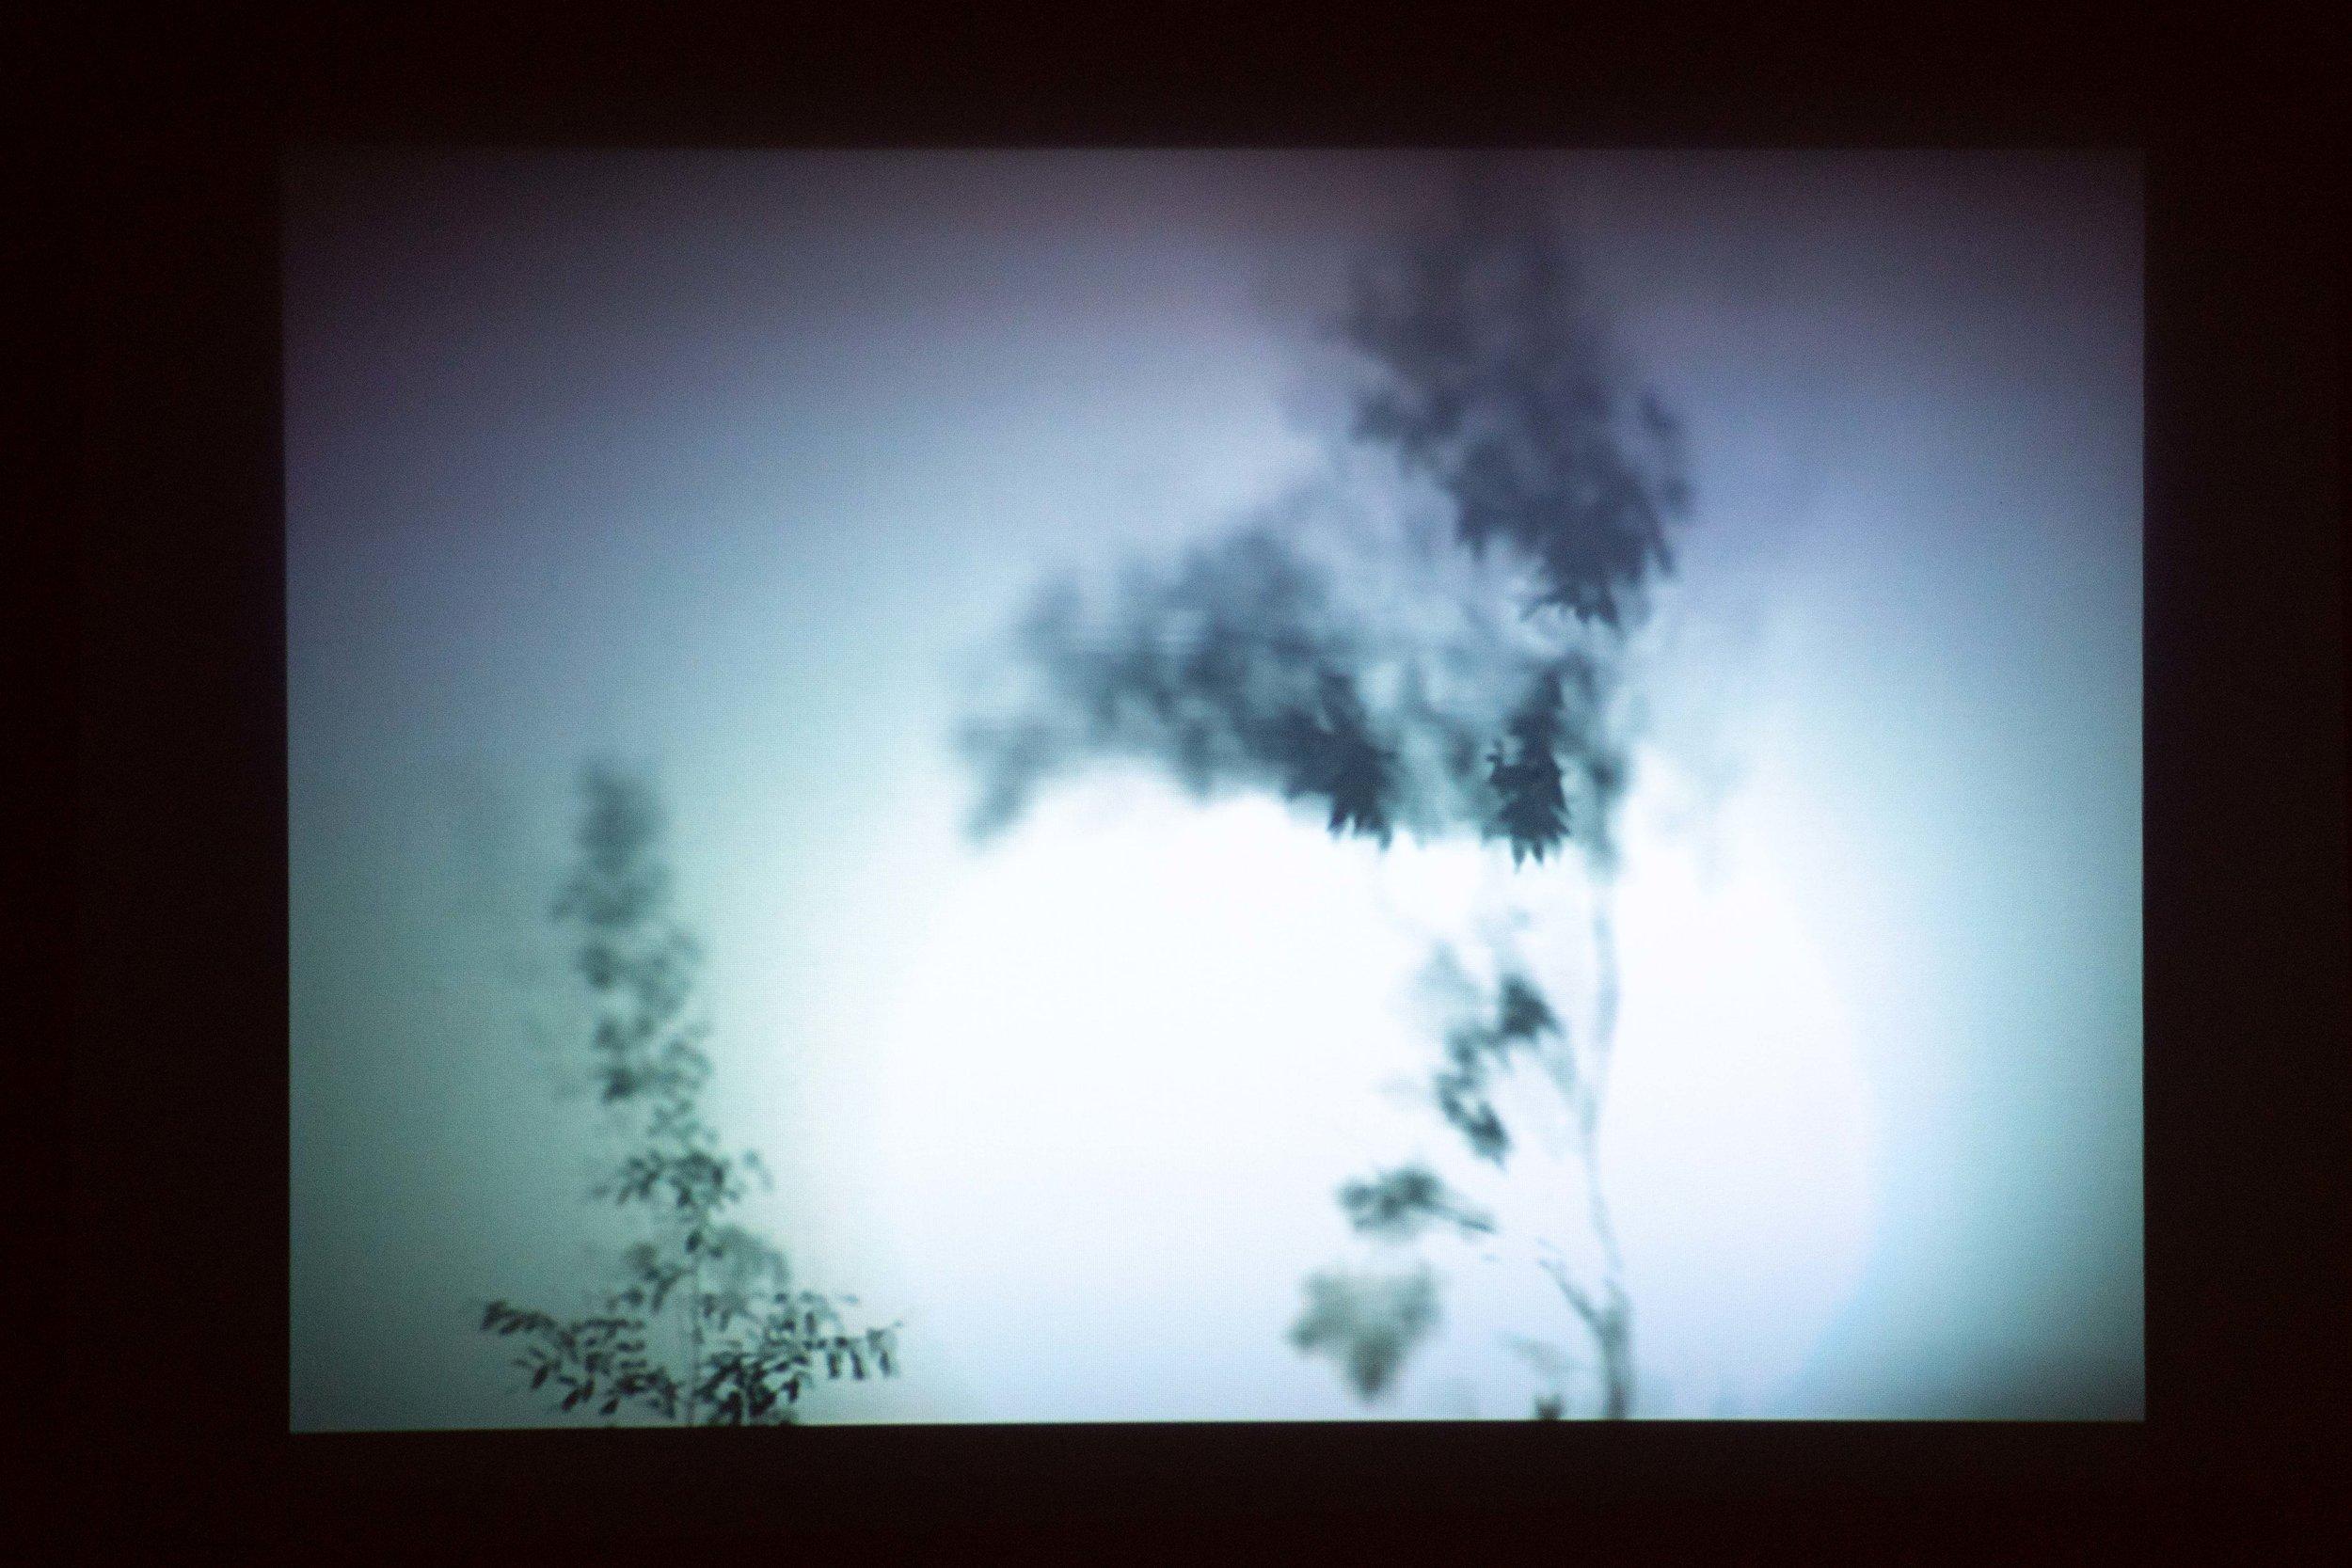 Cho Duck Hyun 조덕현 b. 1957   The Garden of Sound 음(音)의 정원 2015 Mixed Media, fabric, LED light, Dimension variable Music by Yun I-sang 음악 윤이상